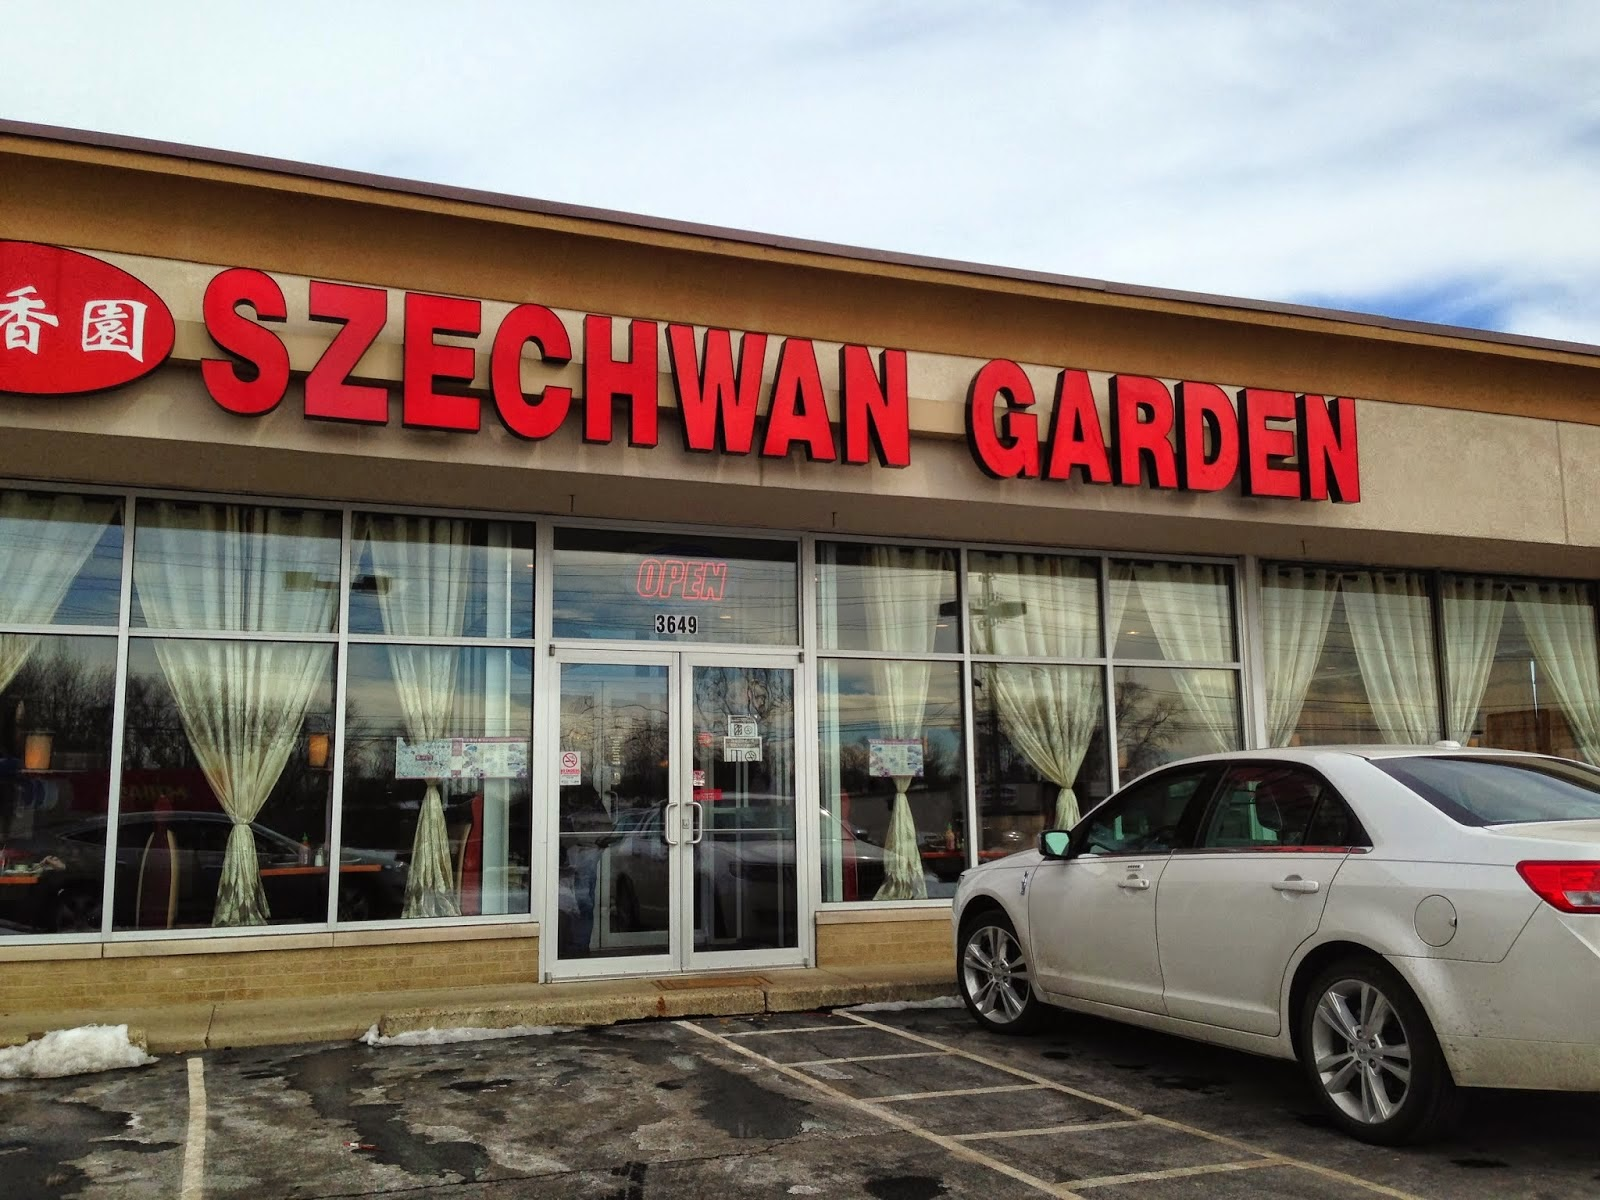 Indianapolis restaurant scene szechwan garden revisit for China garden restaurant indianapolis in